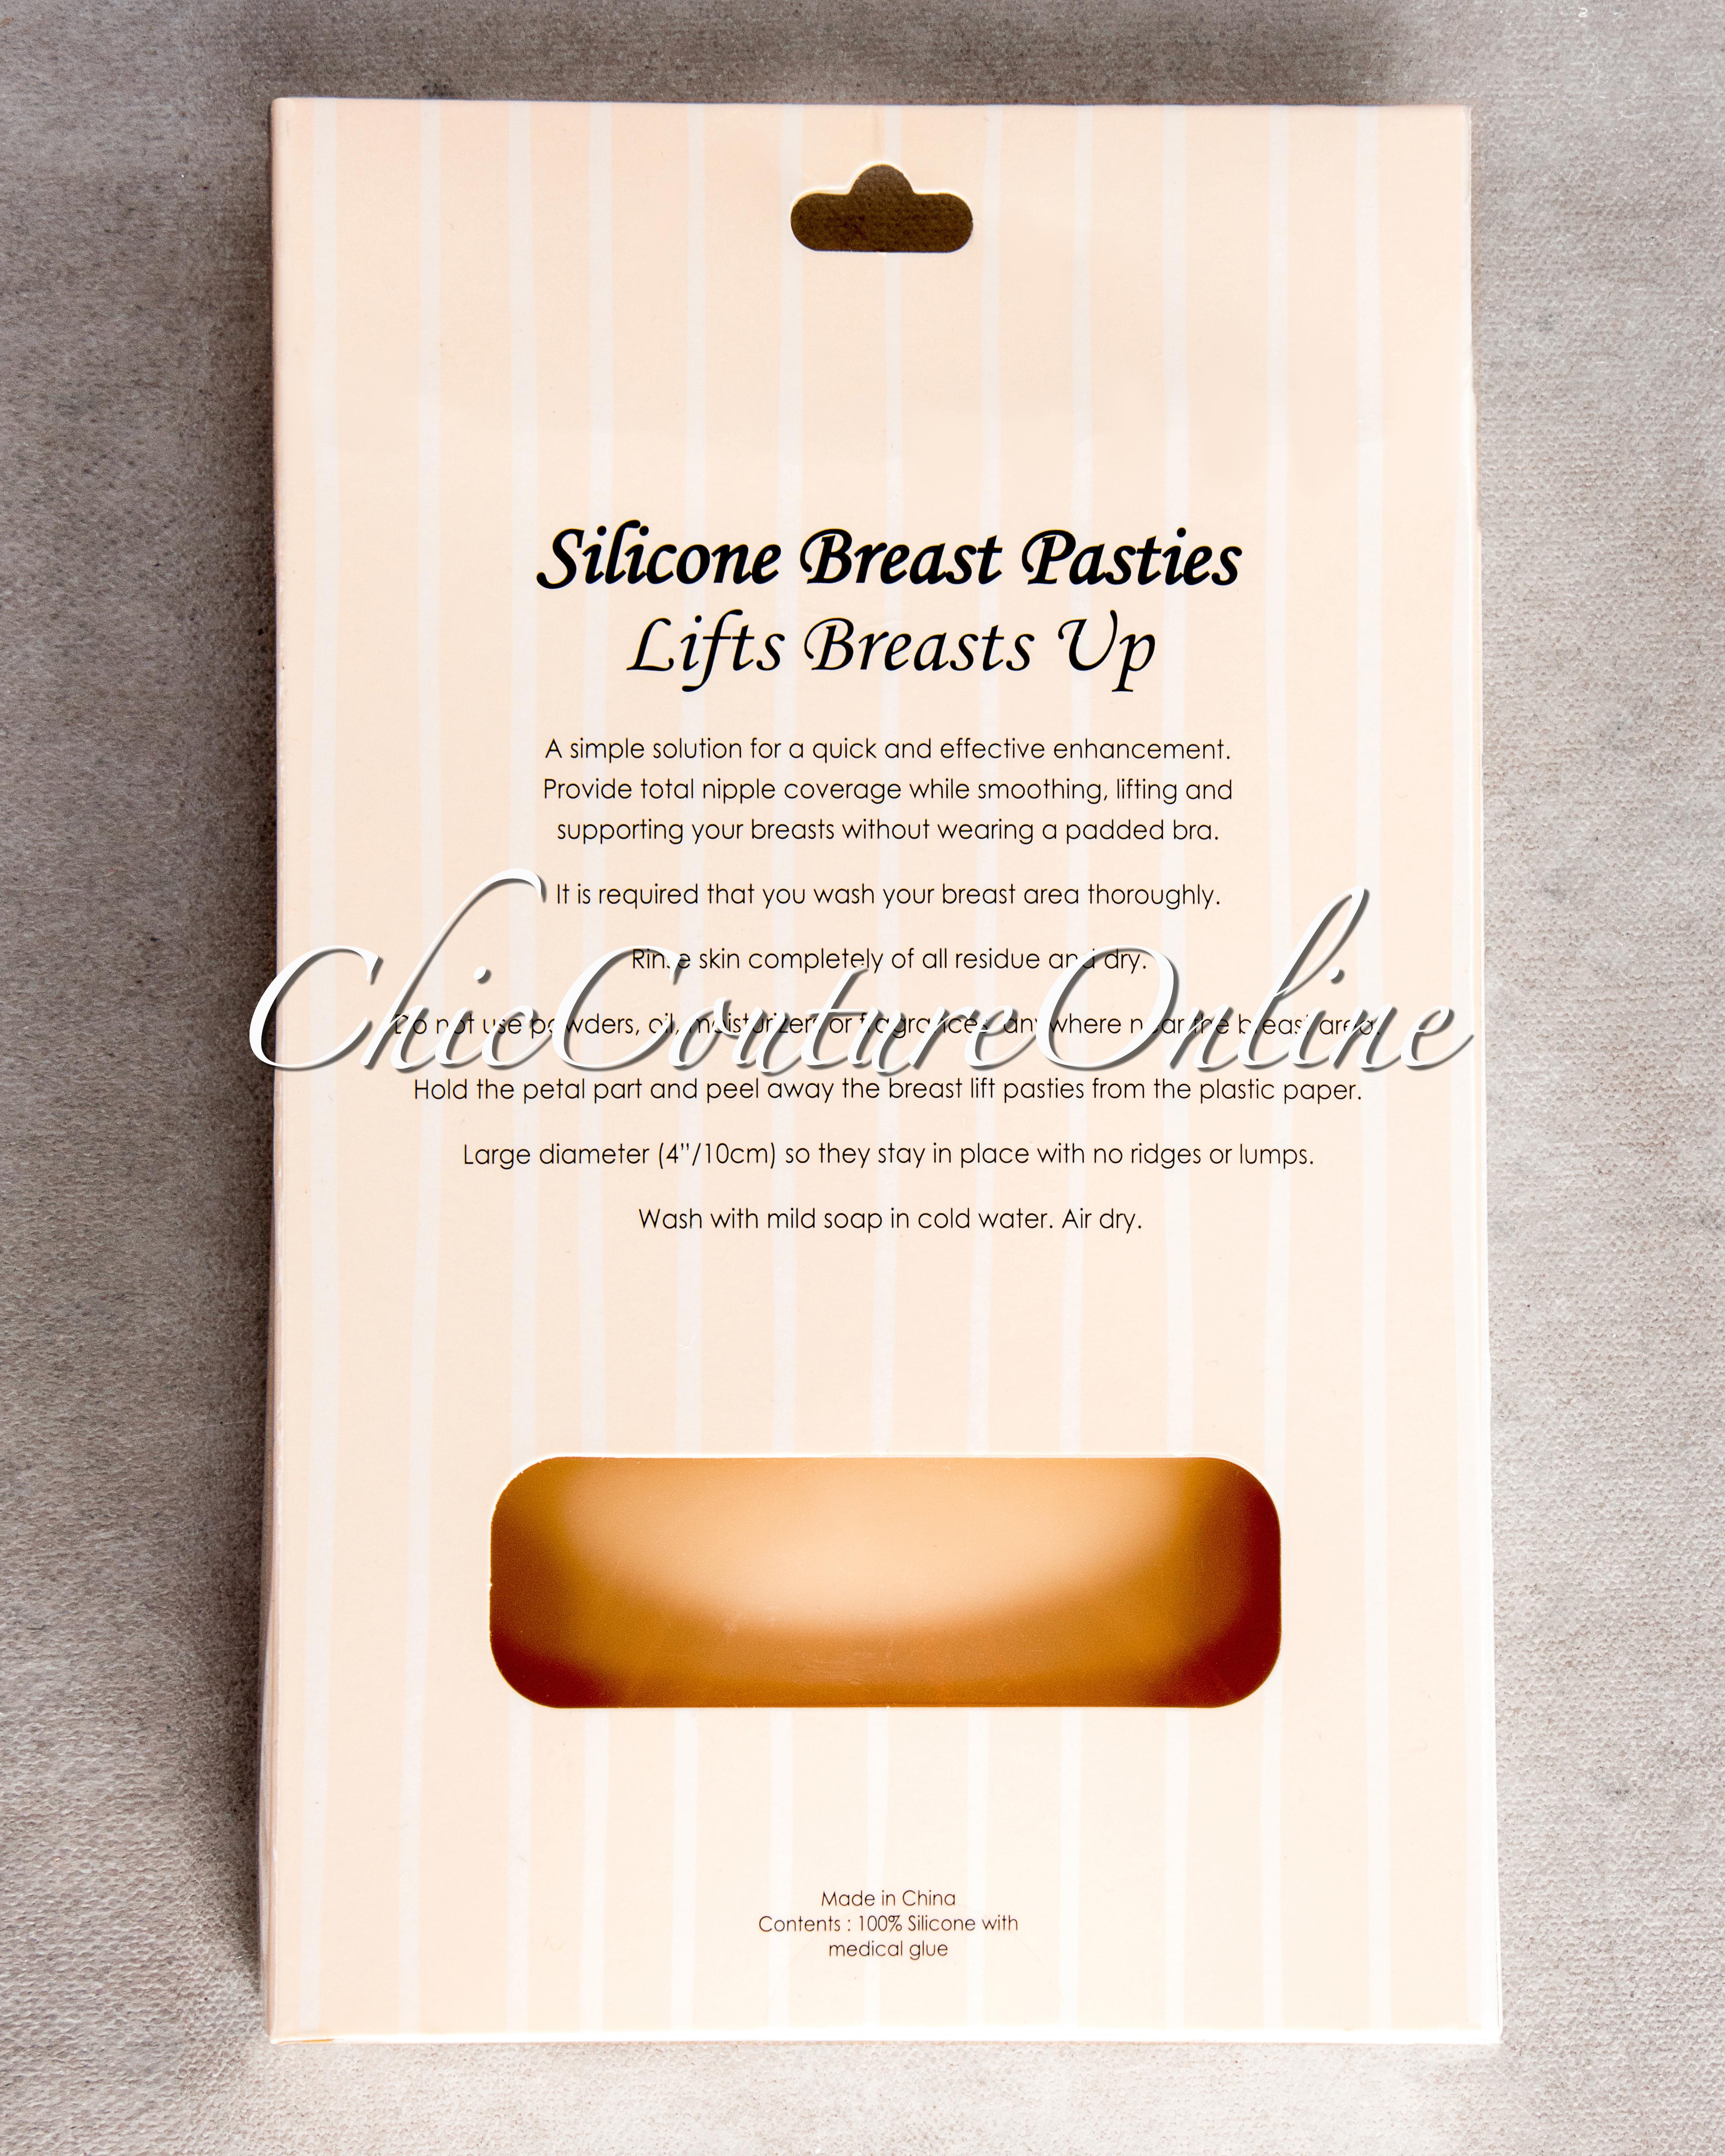 Magic Silicone Breast Lift Pasties